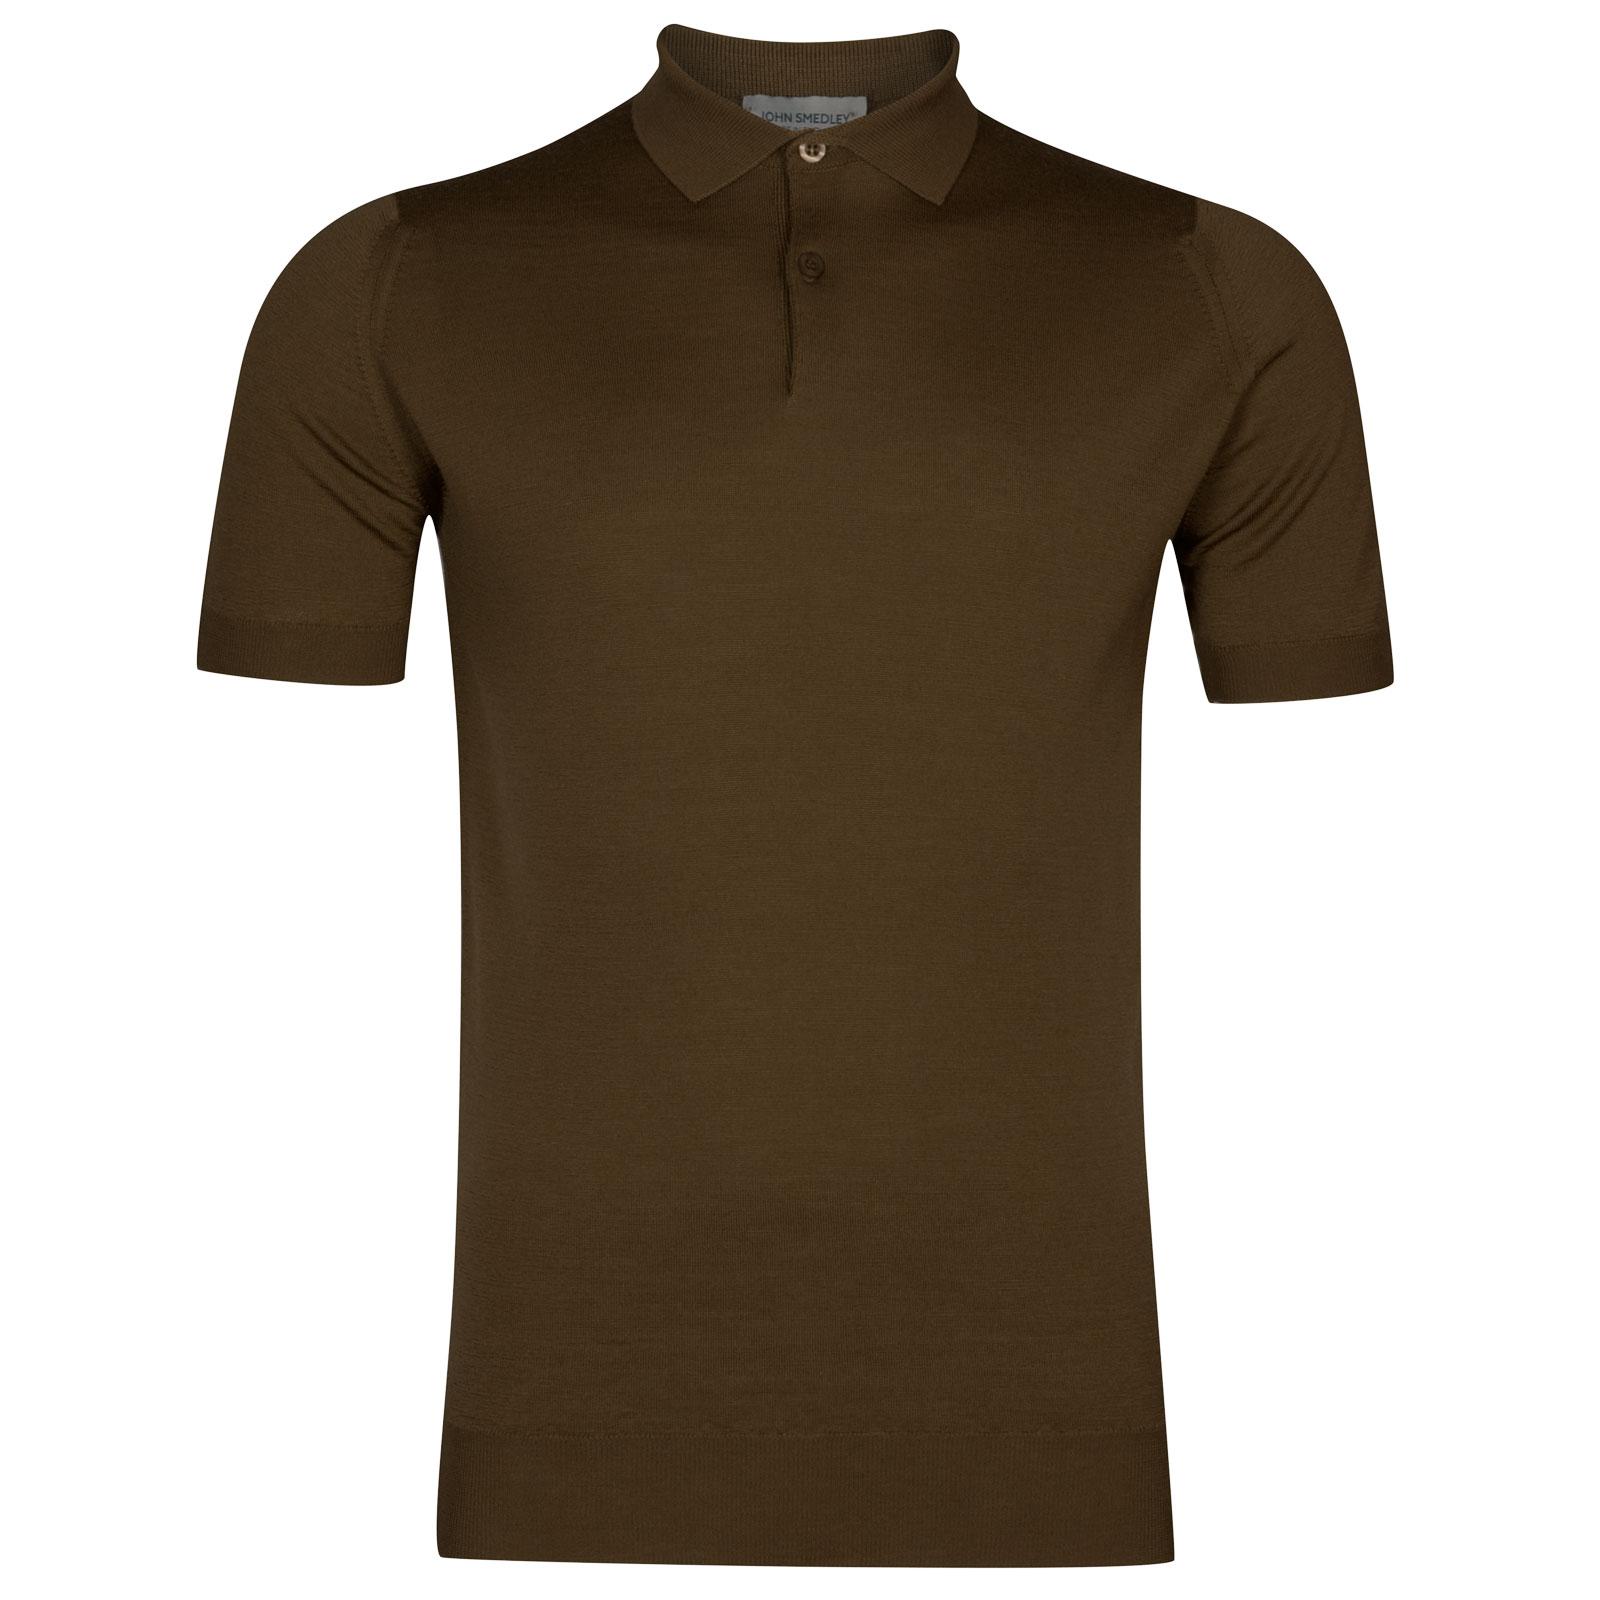 John Smedley payton Merino Wool Shirt in Kielder Green-M